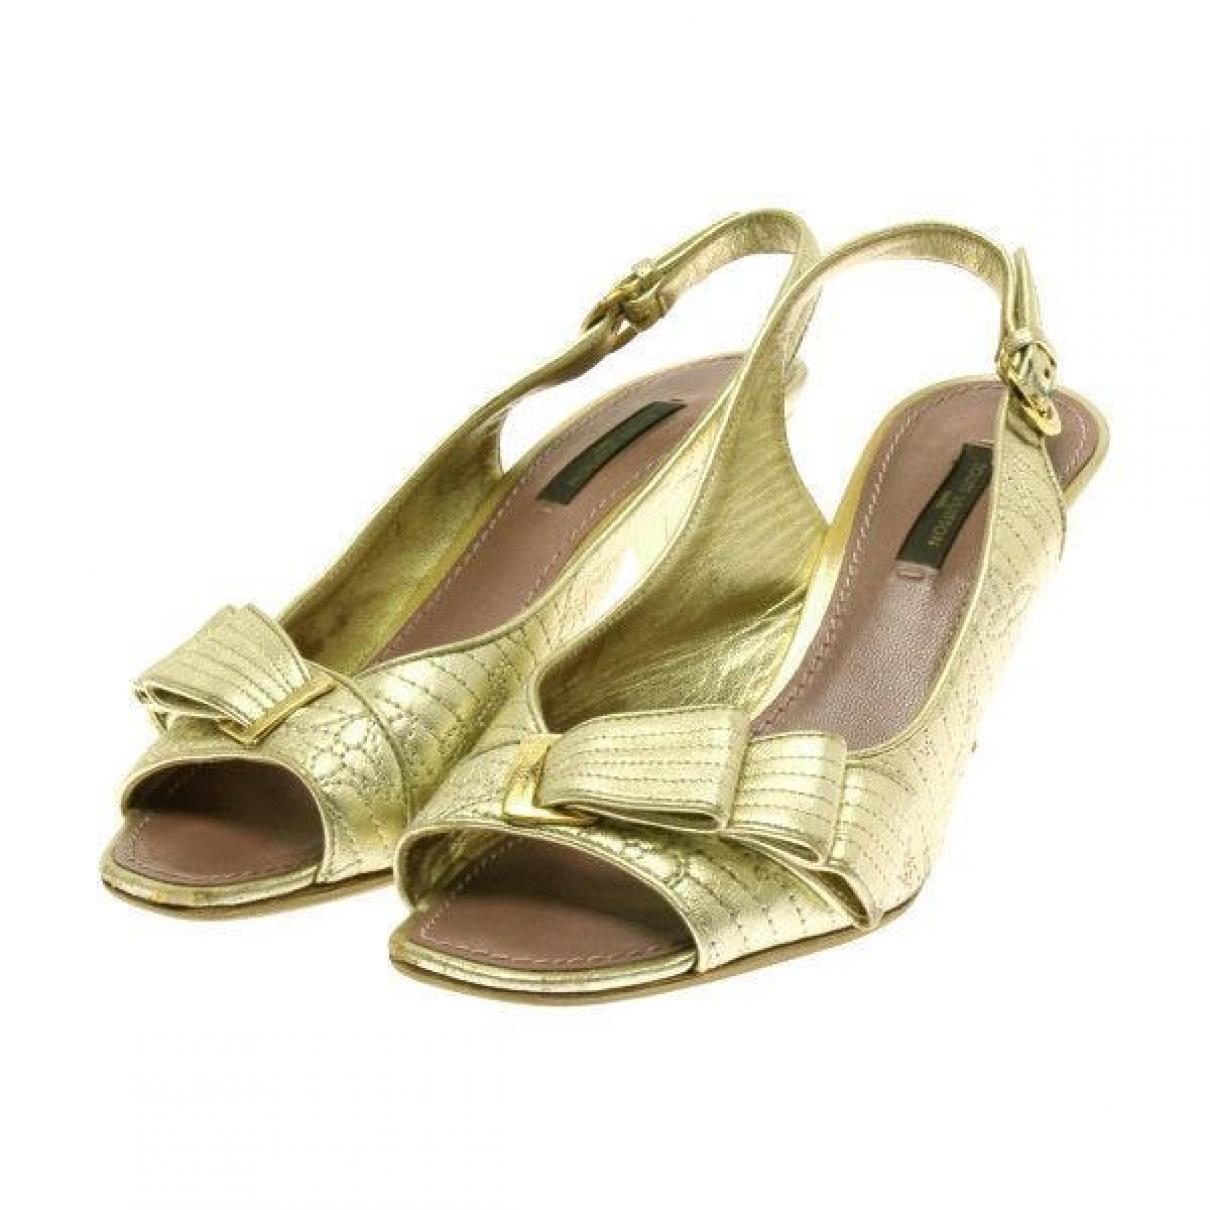 Sandalias de Lona Louis Vuitton